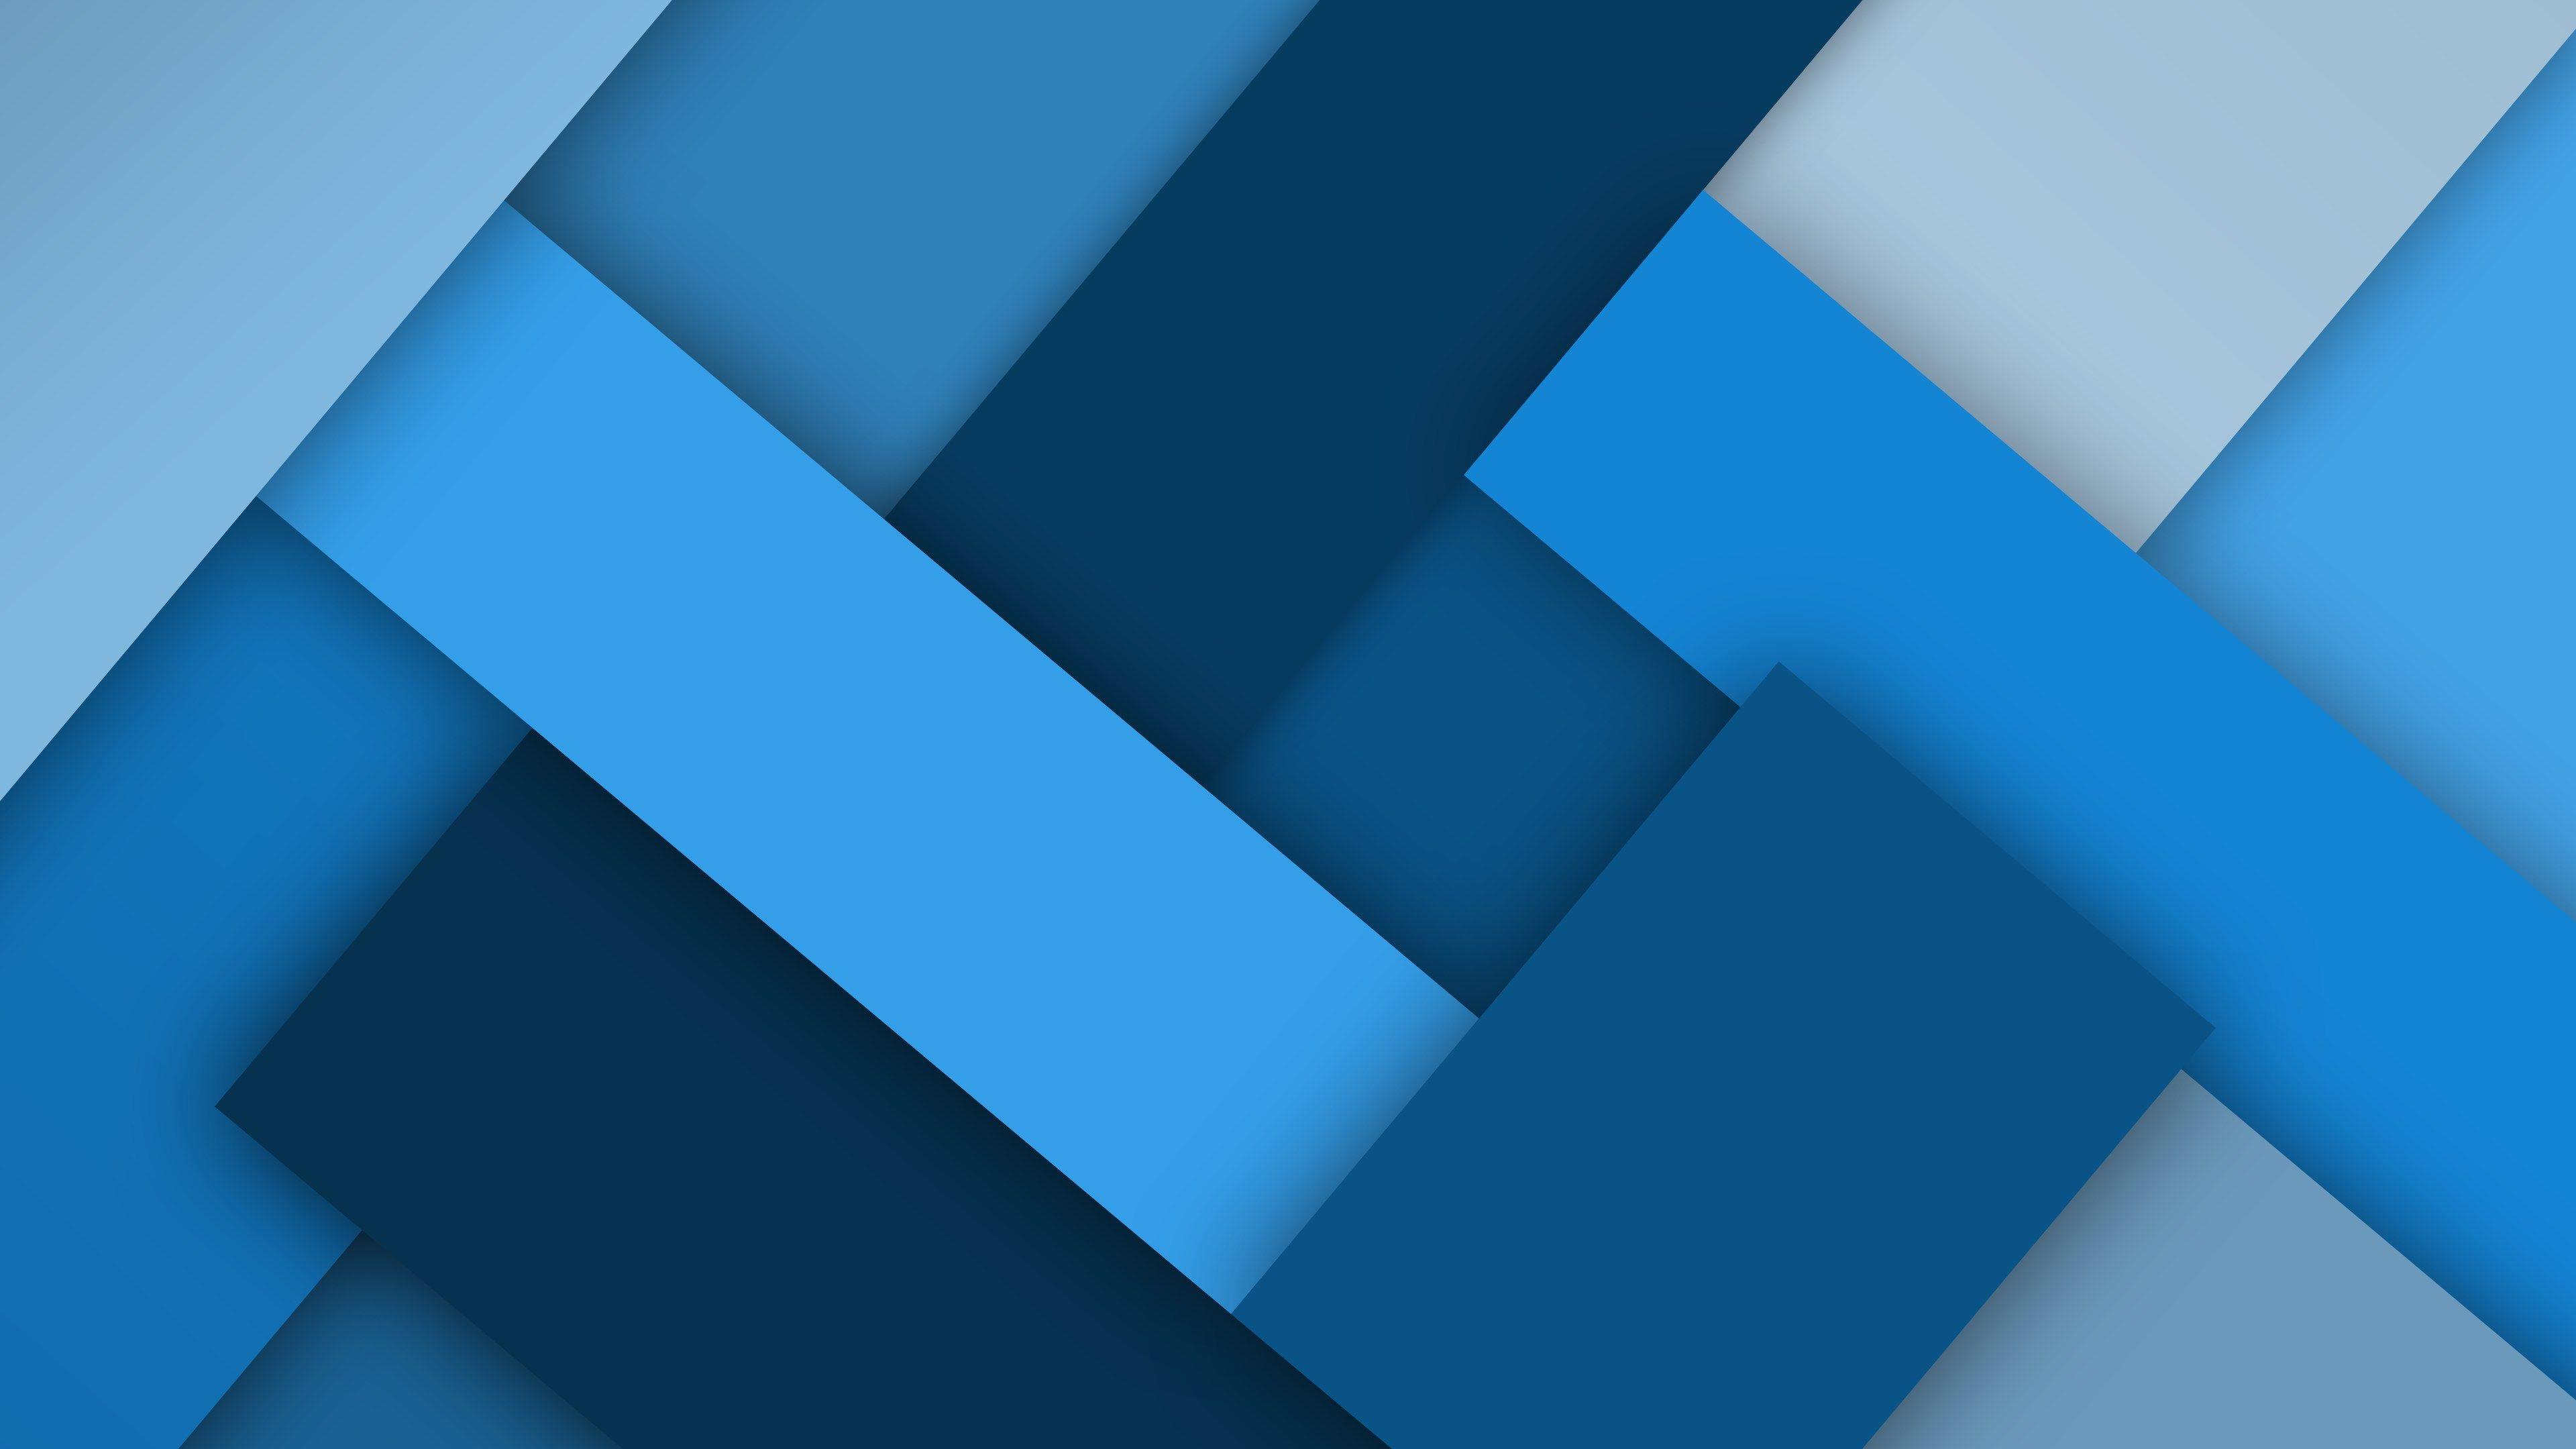 3840x2160 Free Desktop Abstract Arriere Plan Fond Ecran Ecran